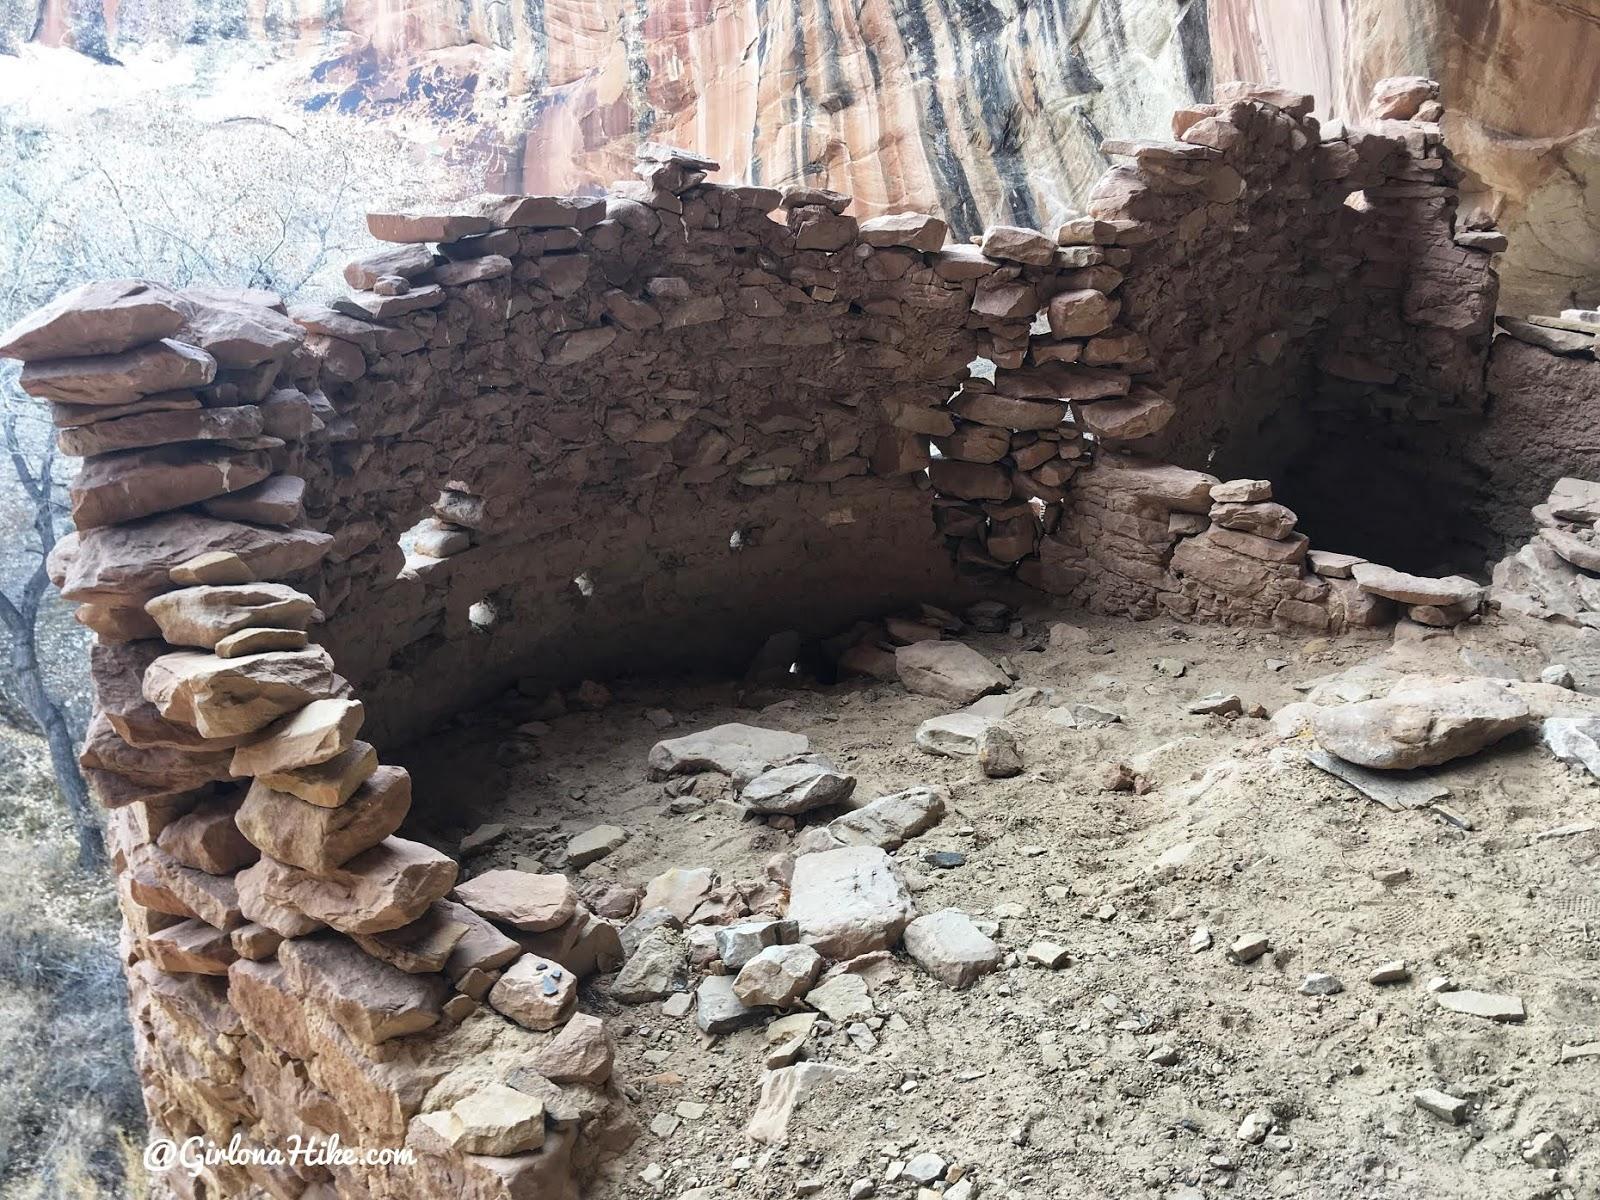 Exploring the Comb Ridge Canyons & Ruins, Cedar Mesa, Butler Wash, Monarch Cave Ruins